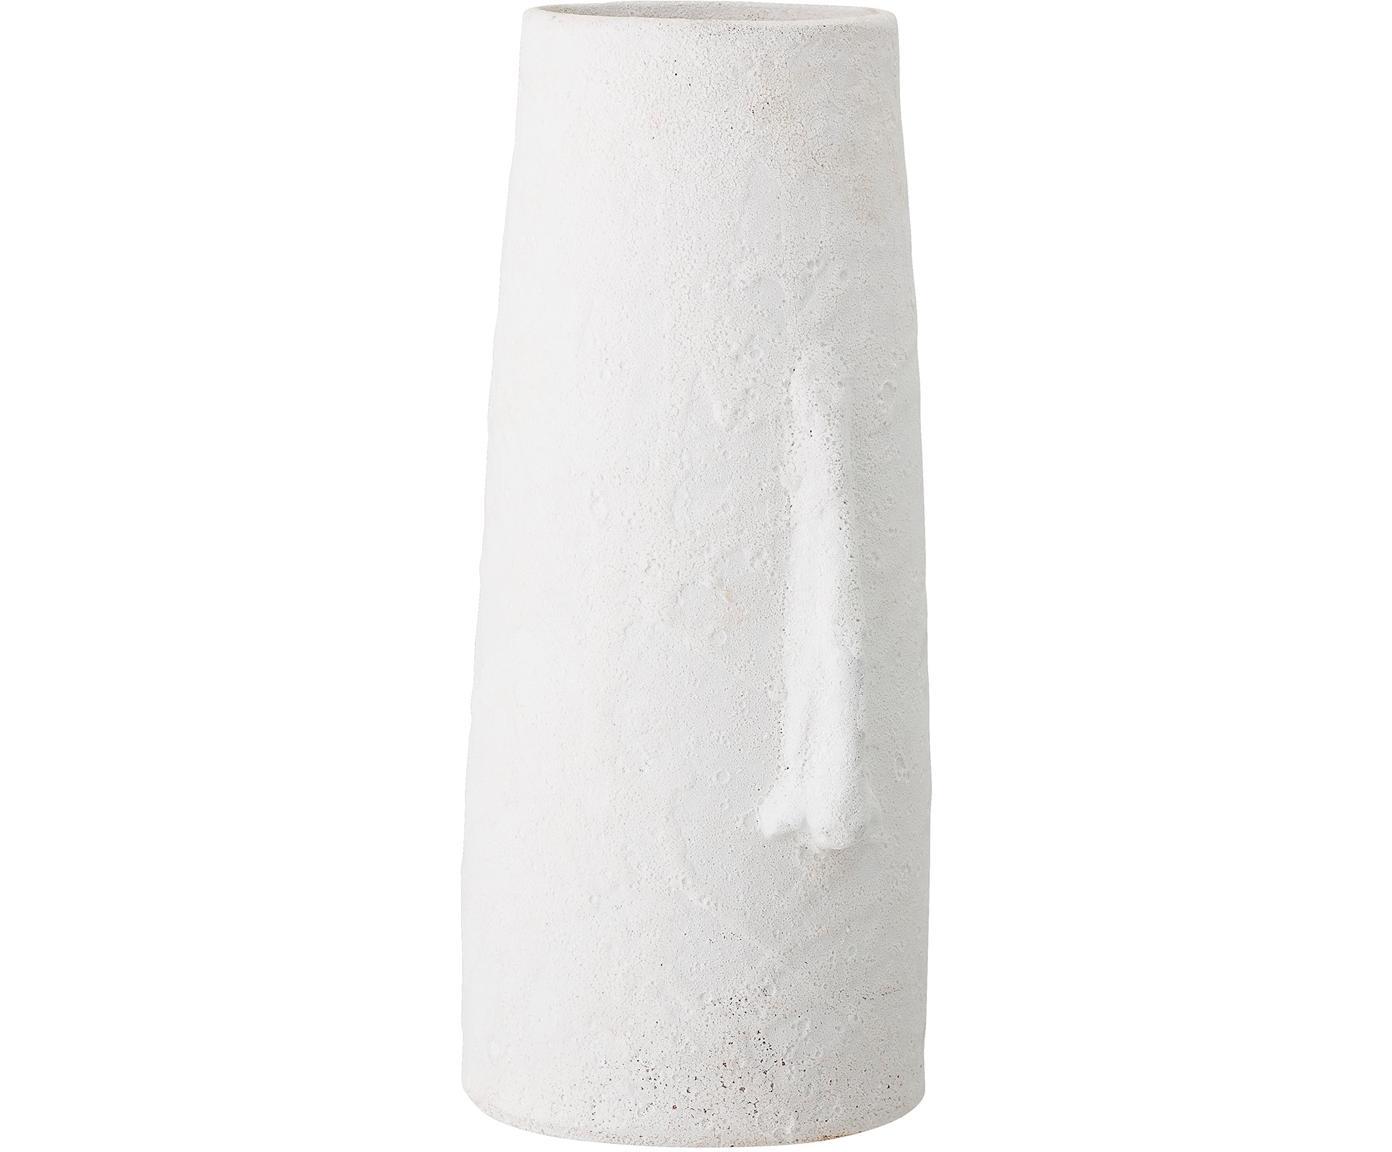 Decoratieve vaas Nose, Terracotta, Wit, 20 x 40 cm